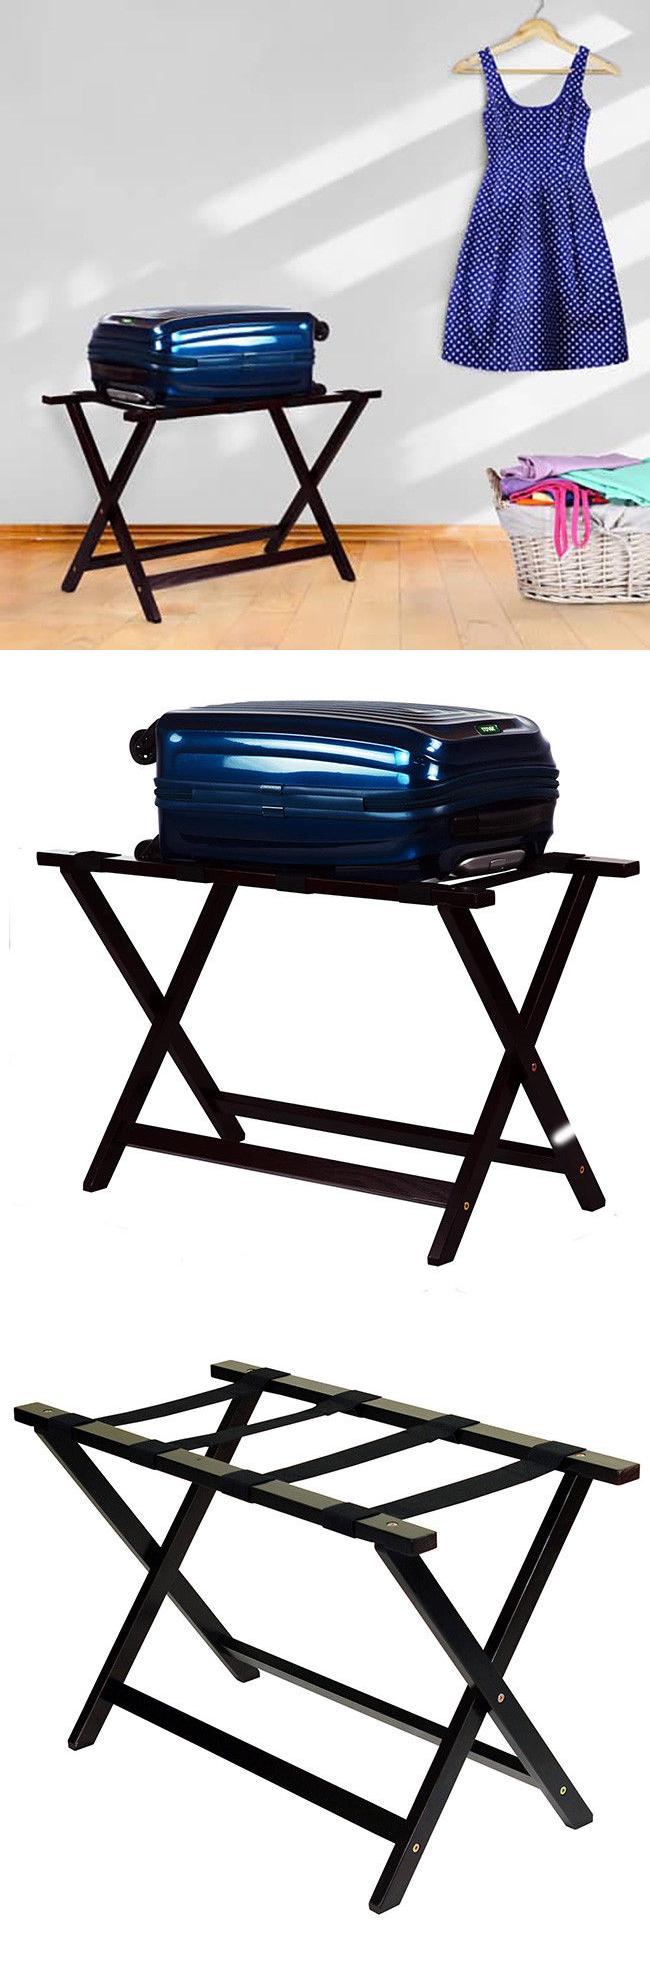 Luggage Straps 164799: Folding Luggage Rack Hotel Suitcase Stand Portable  Holder Wood Shelf Travel Bags